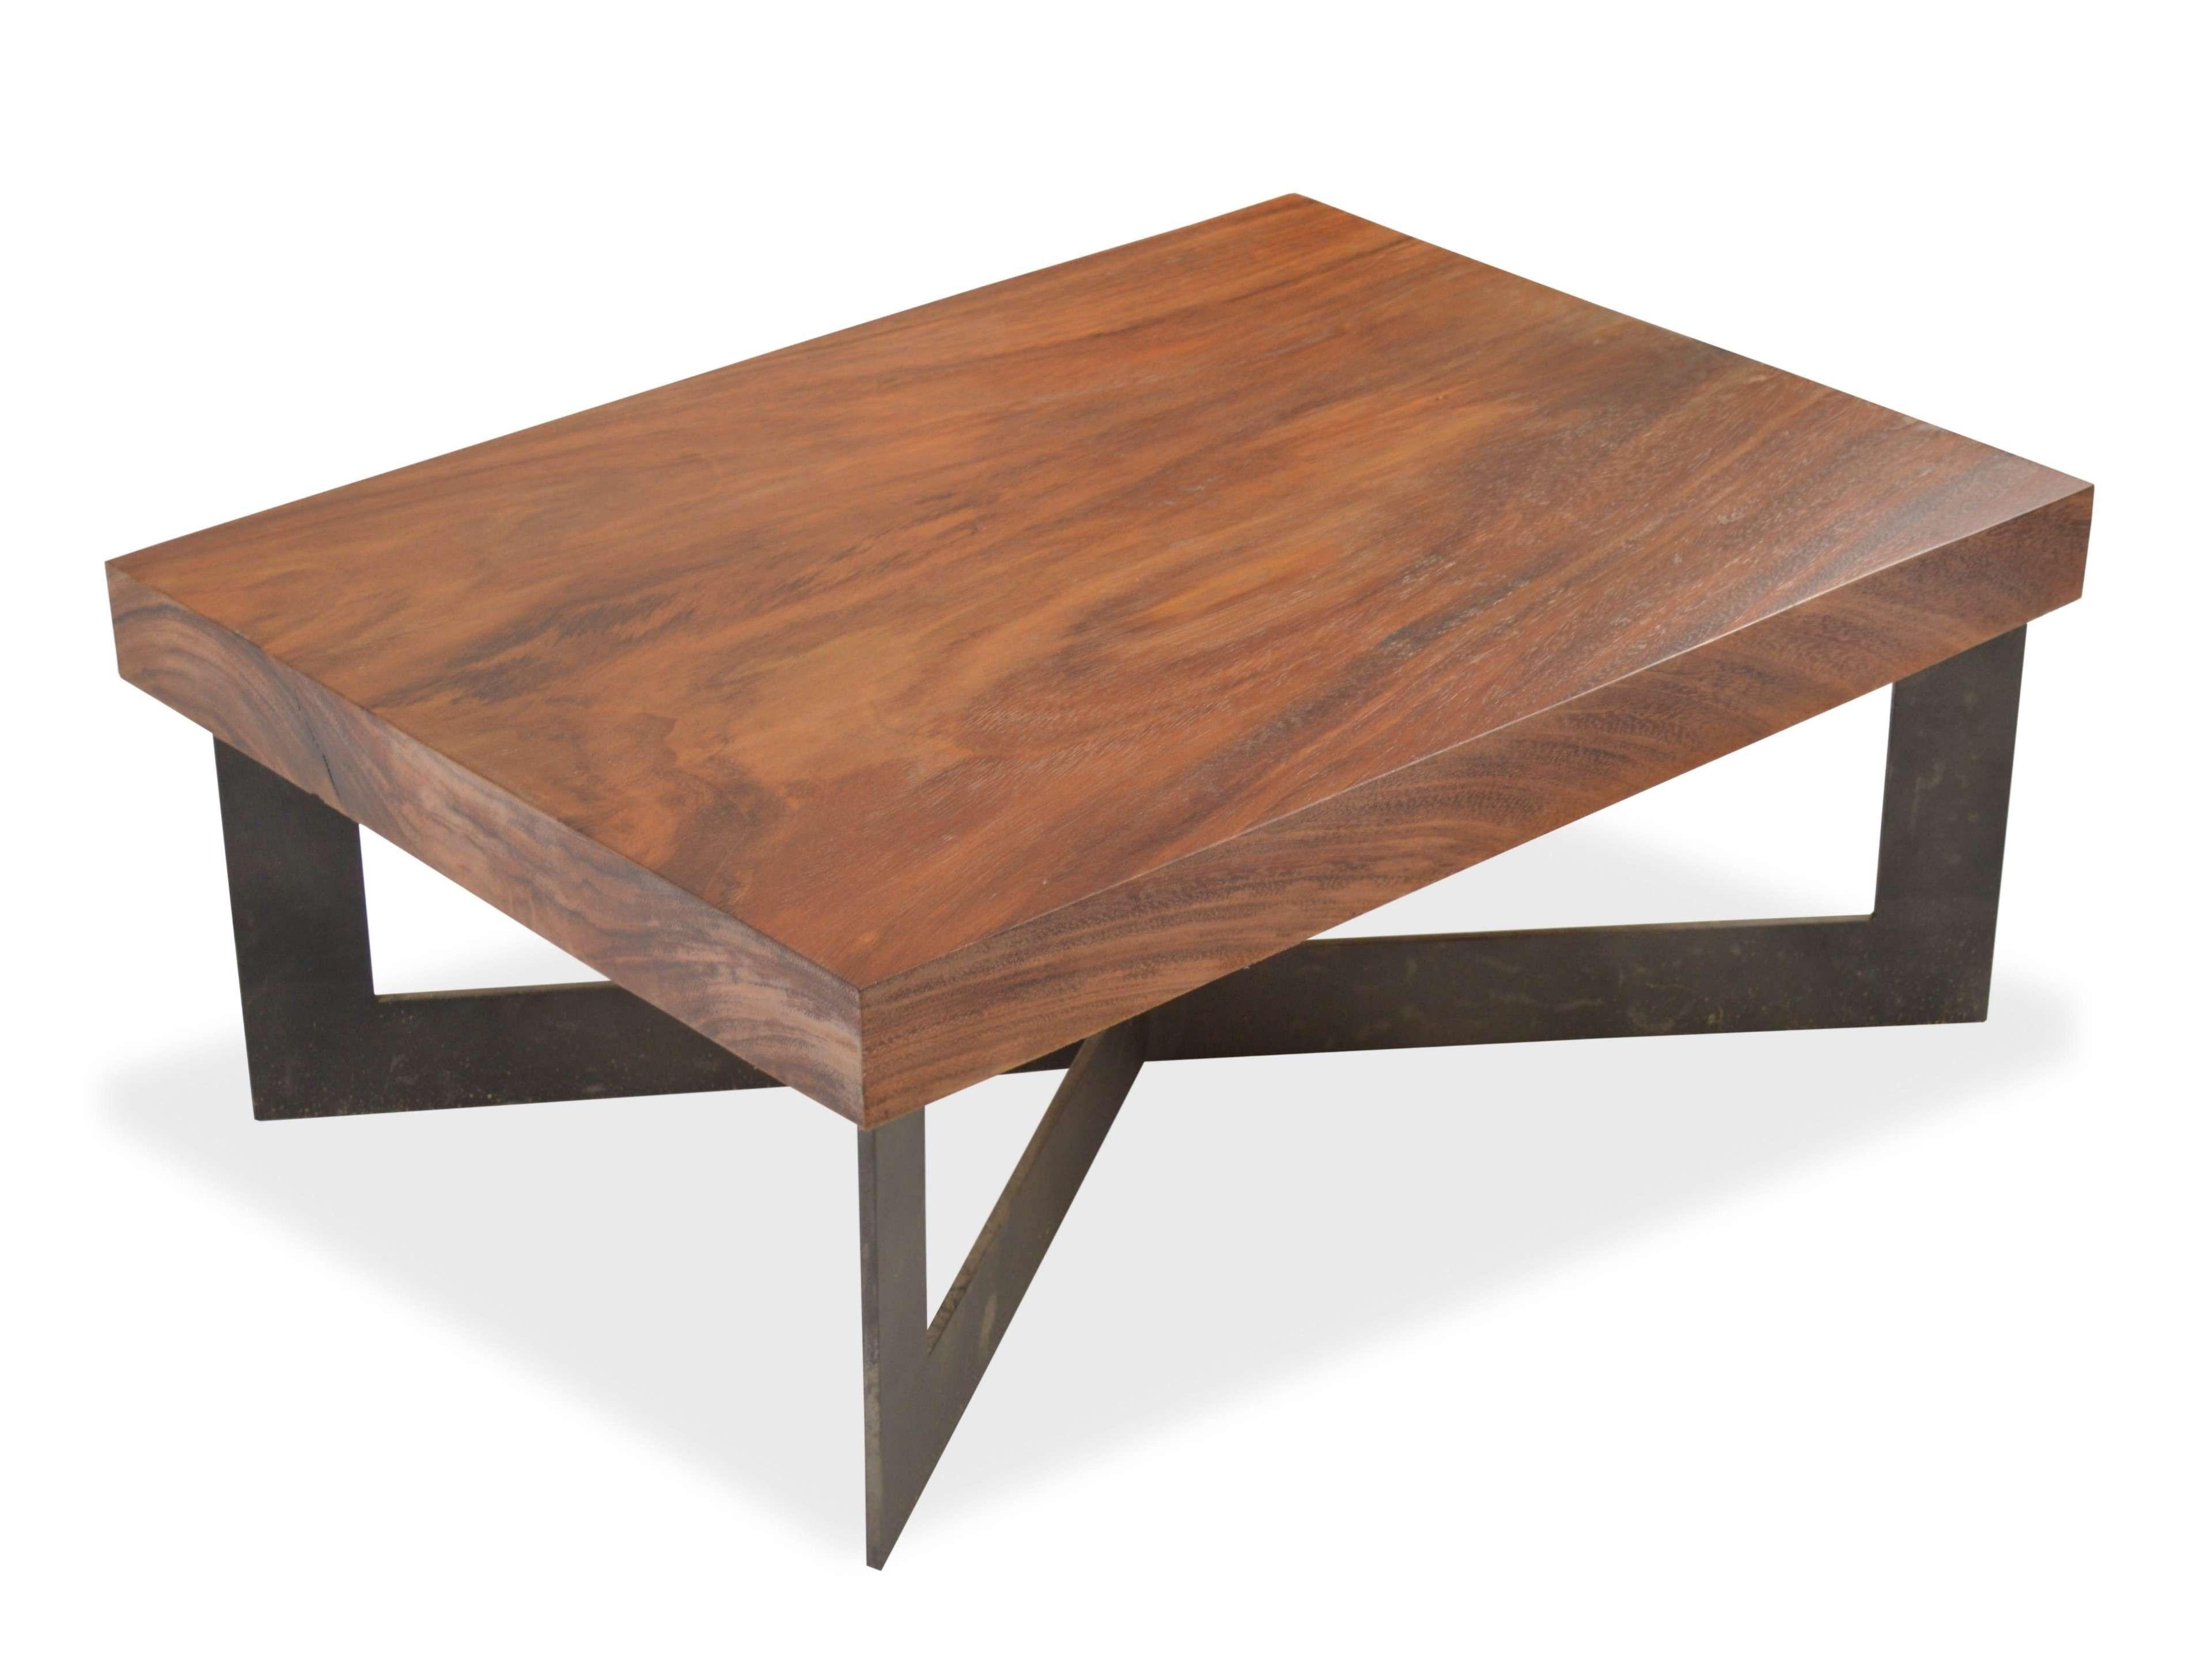 Coffee Tables : Diy Industrial Coffee Table With Plumbing Pipe Regarding Trendy Low Industrial Coffee Tables (View 4 of 20)